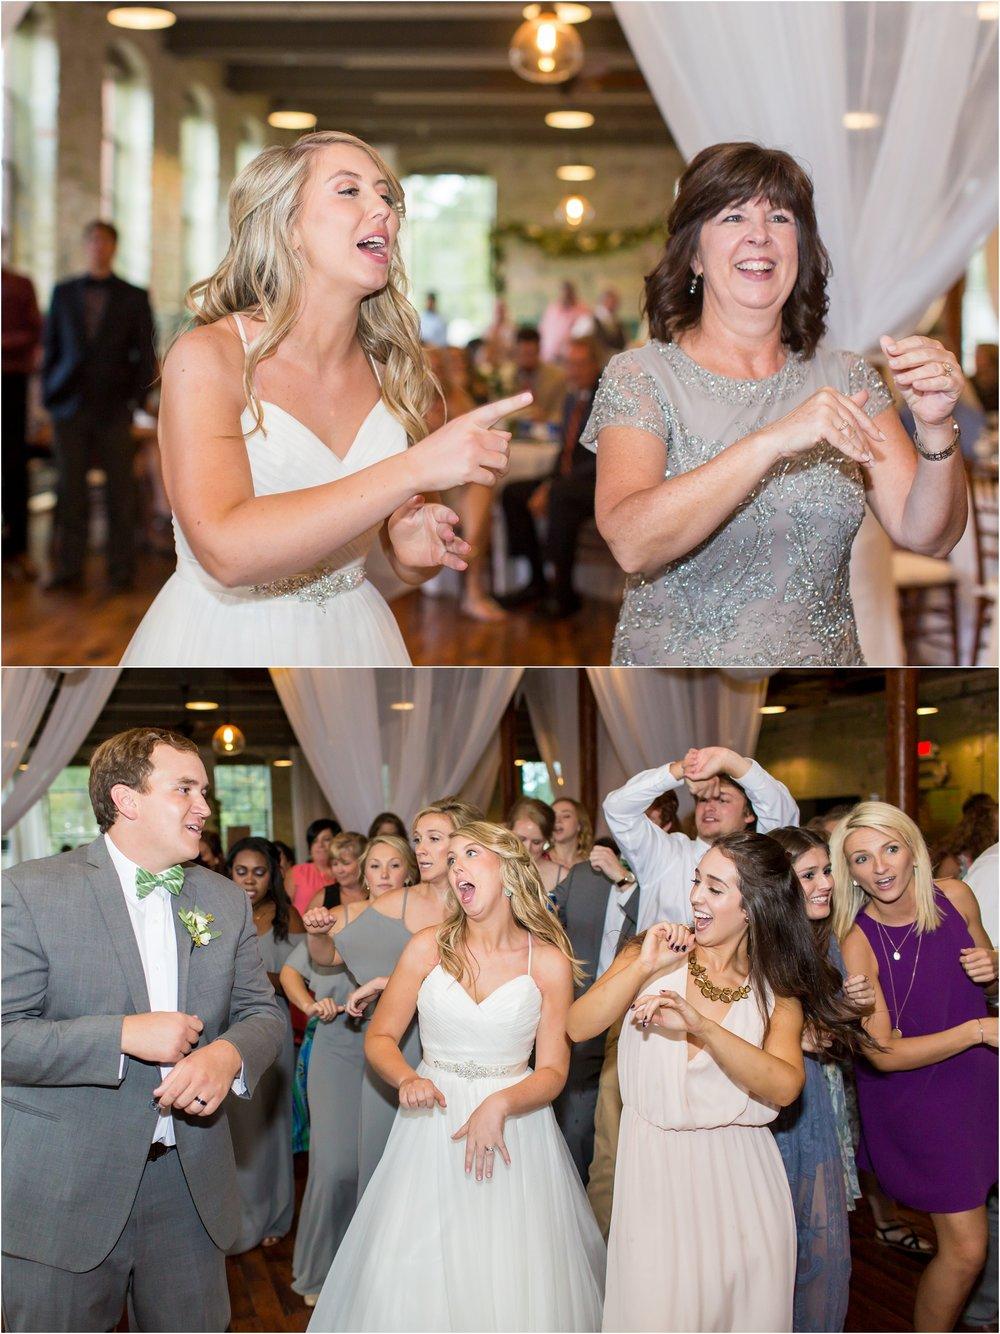 Savannah Eve Photography- Gunter Wedding- Blog-76.jpg